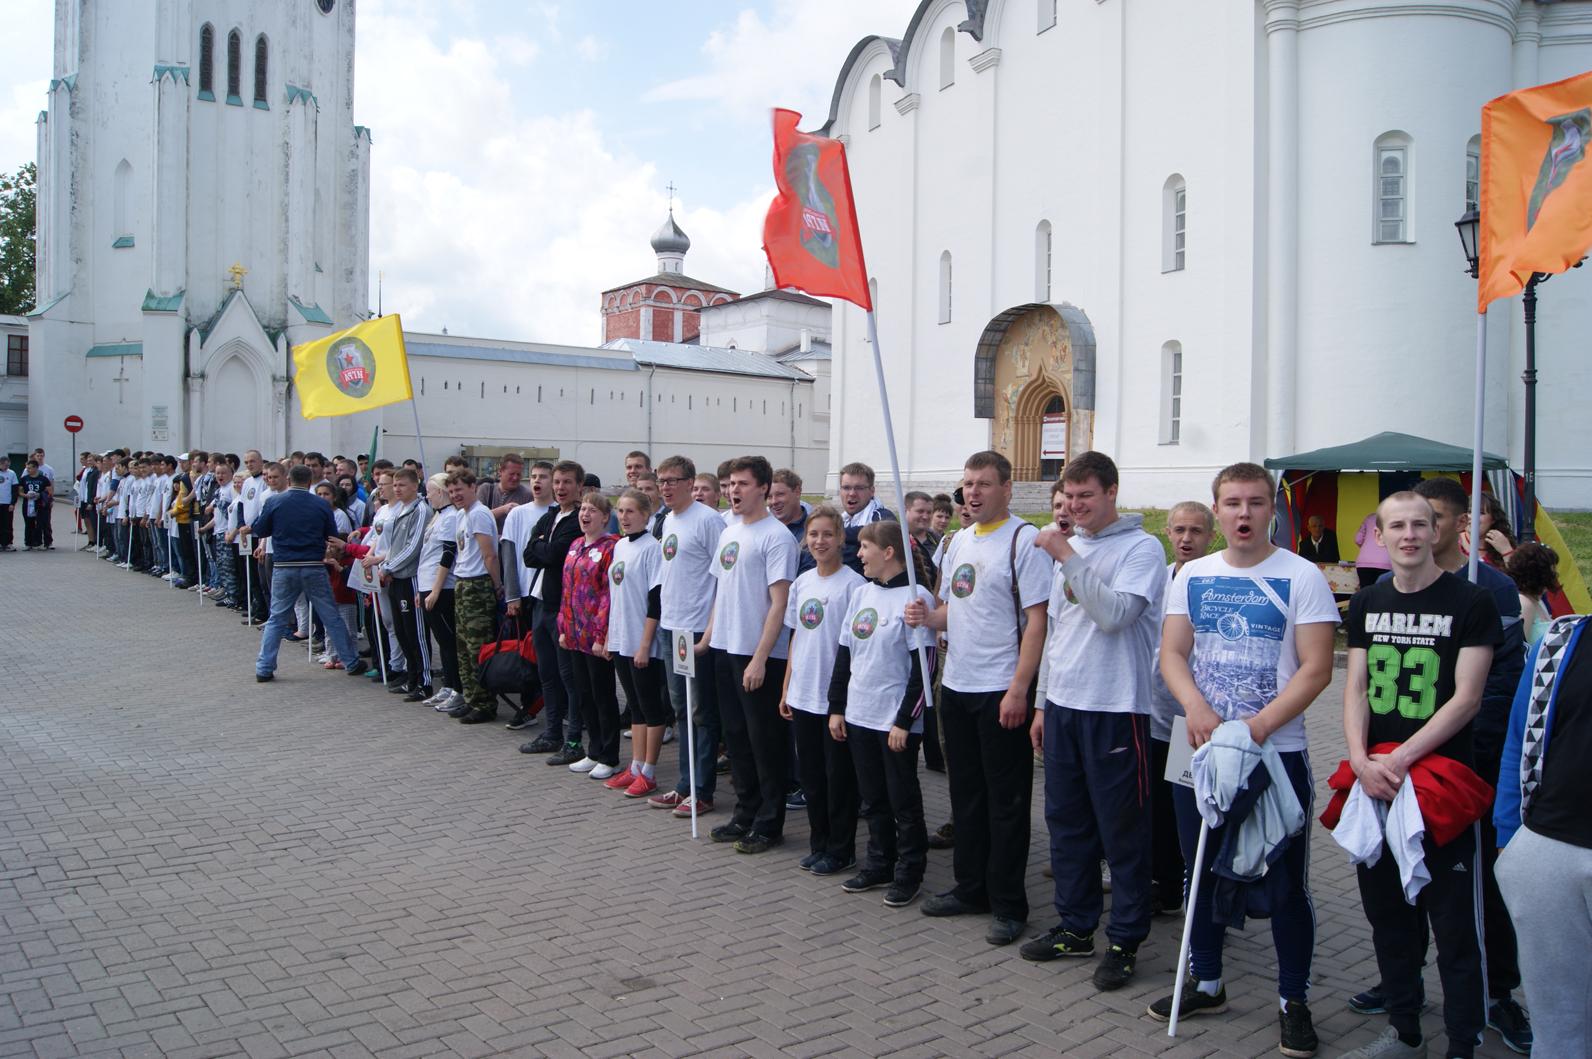 В Вологде 10 спартанцев из МВД победили  на Зарнице